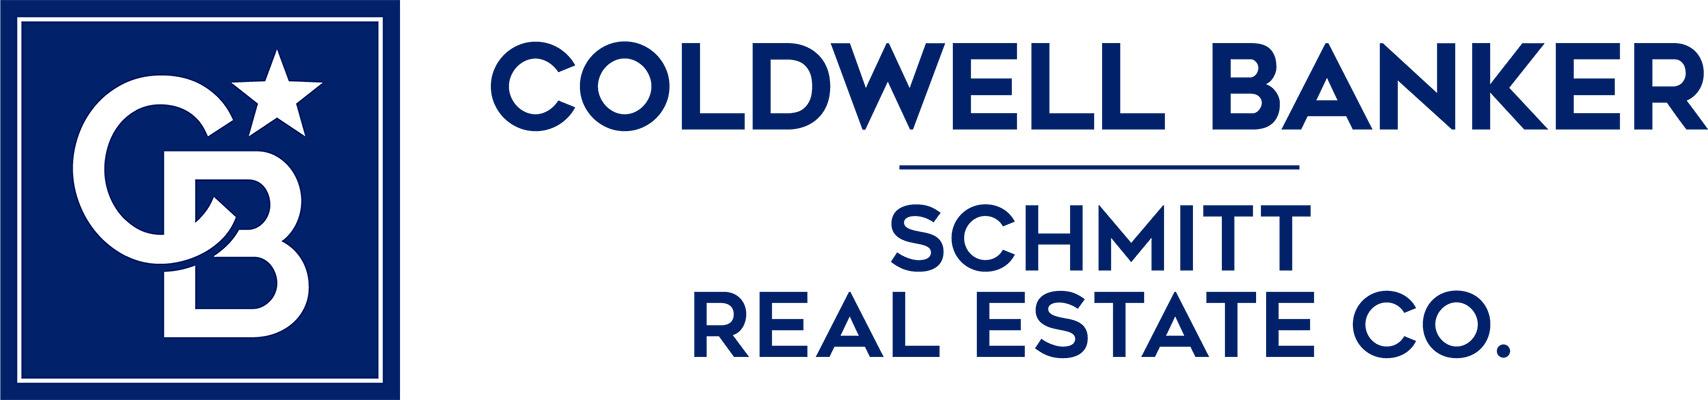 Ashley Lindmar - Coldwell Banker Logo